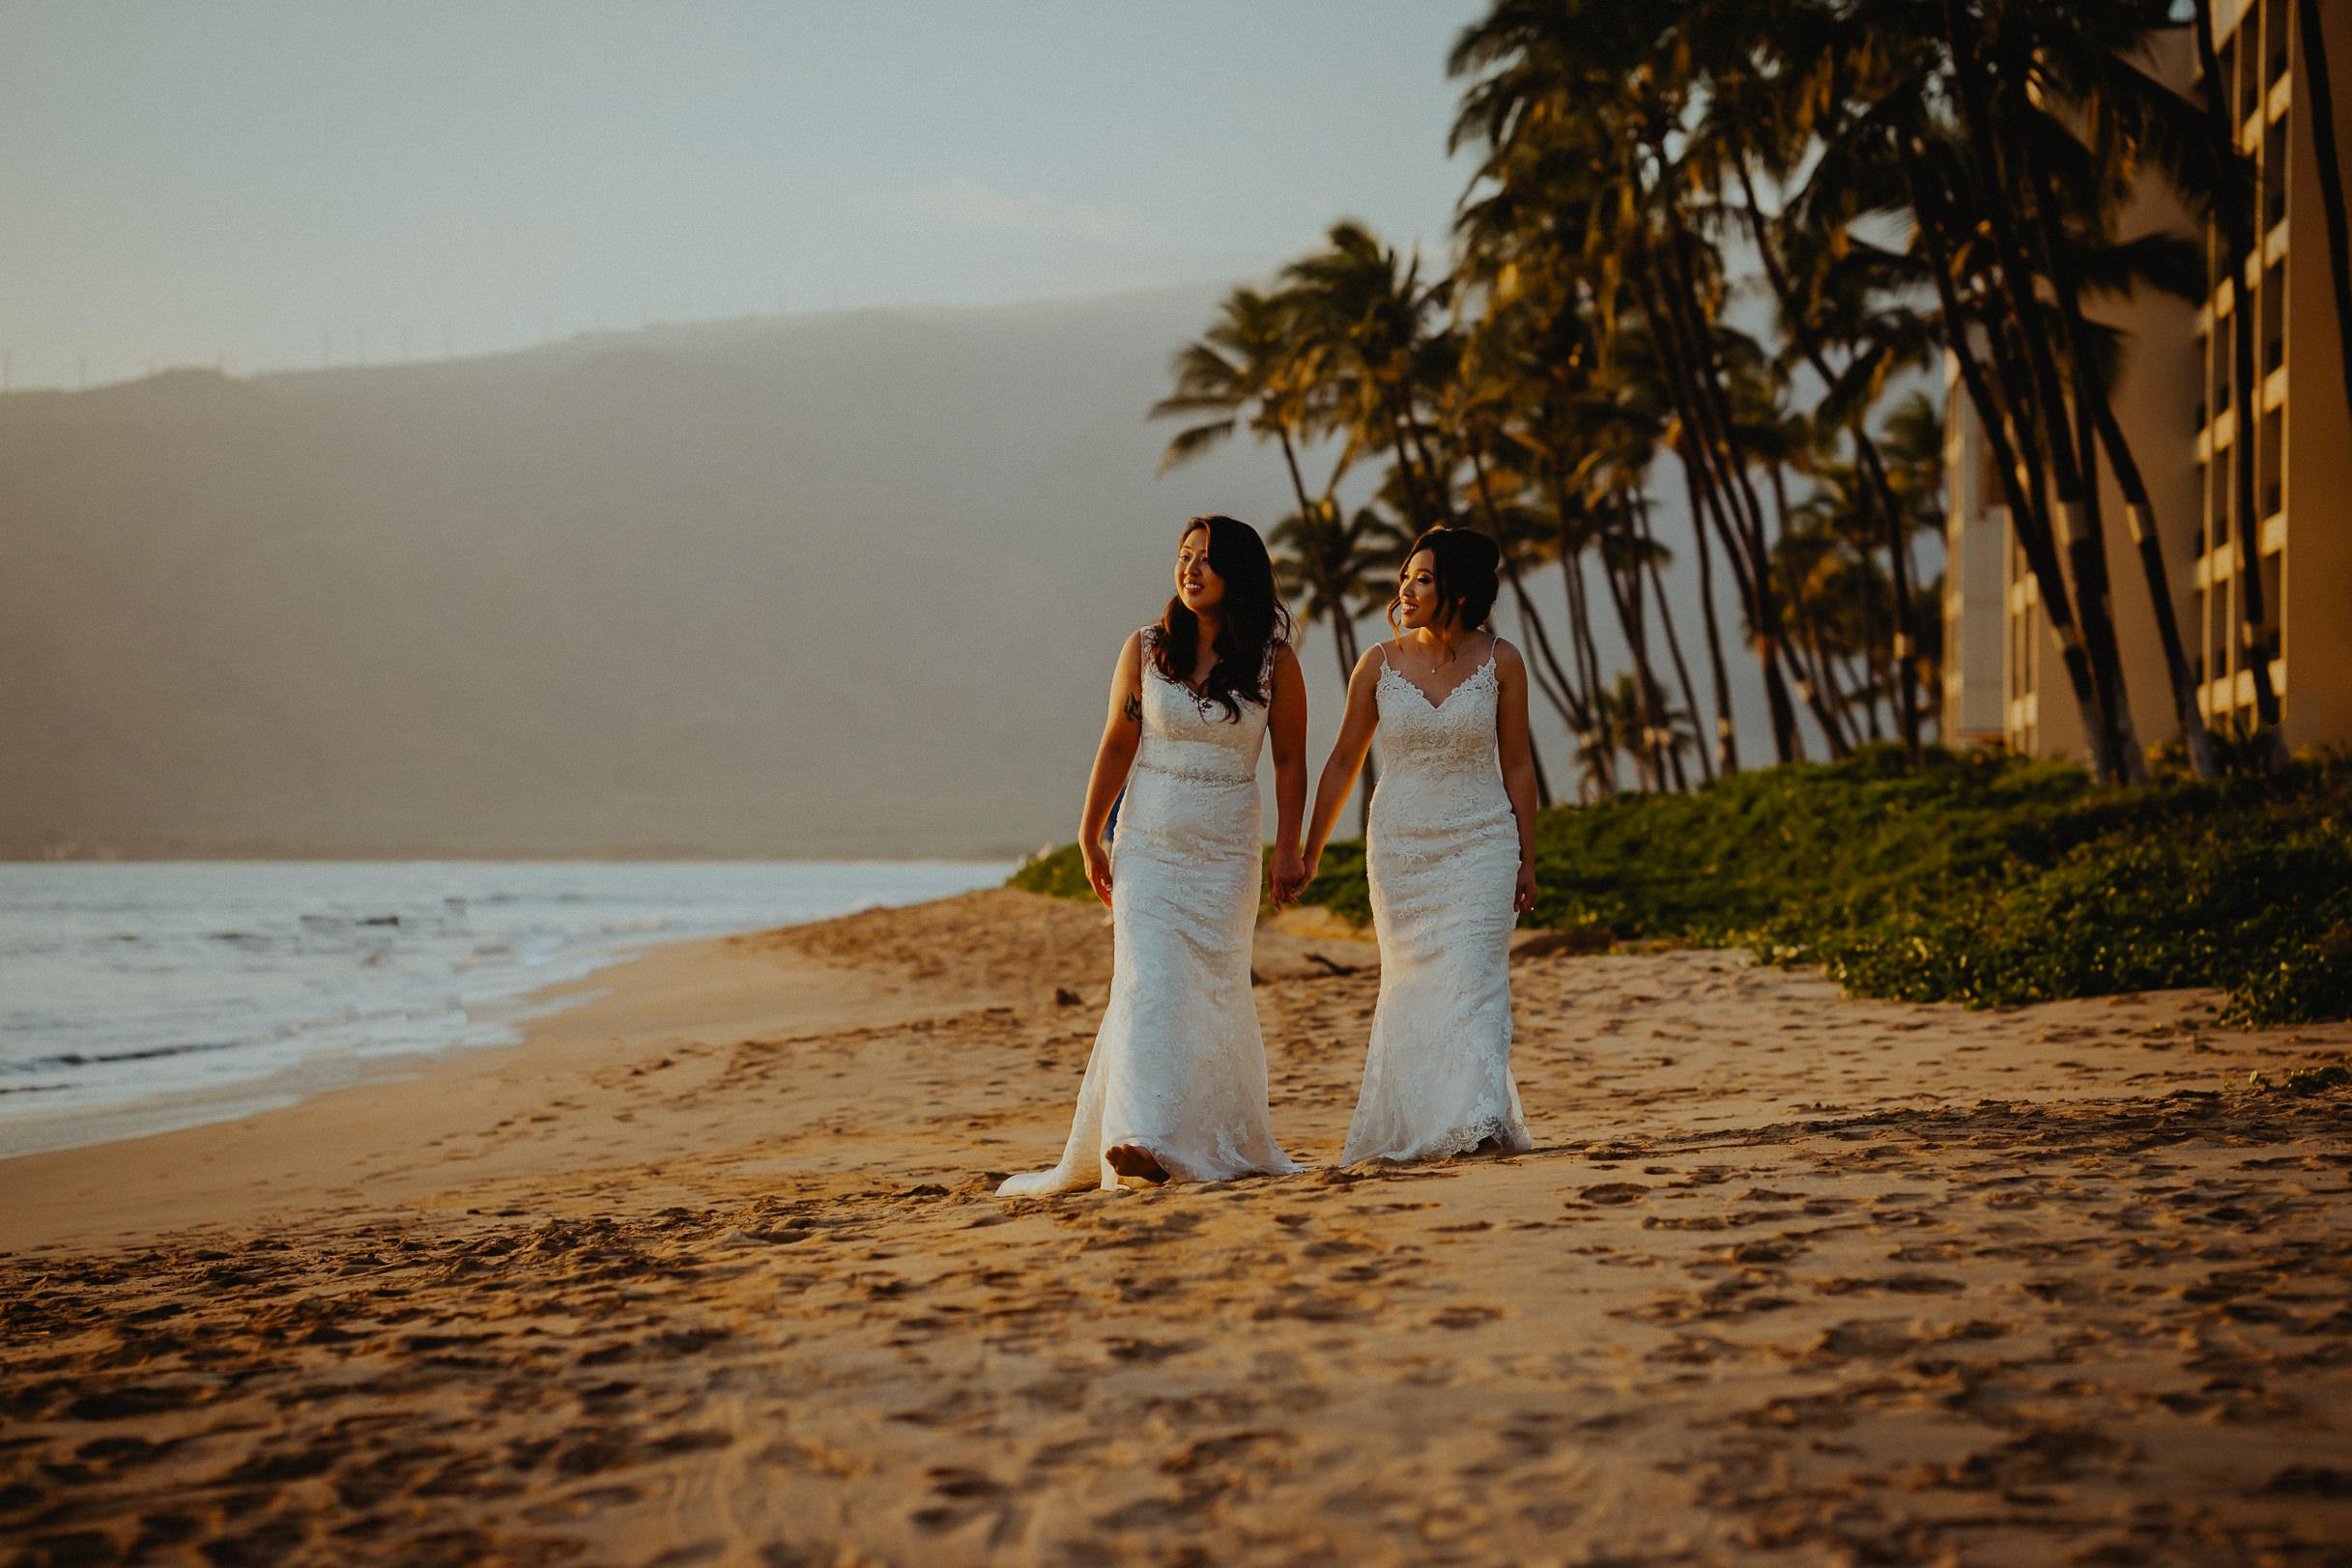 Maui_Destination_wedding_Alfred_Tang-49.jpg